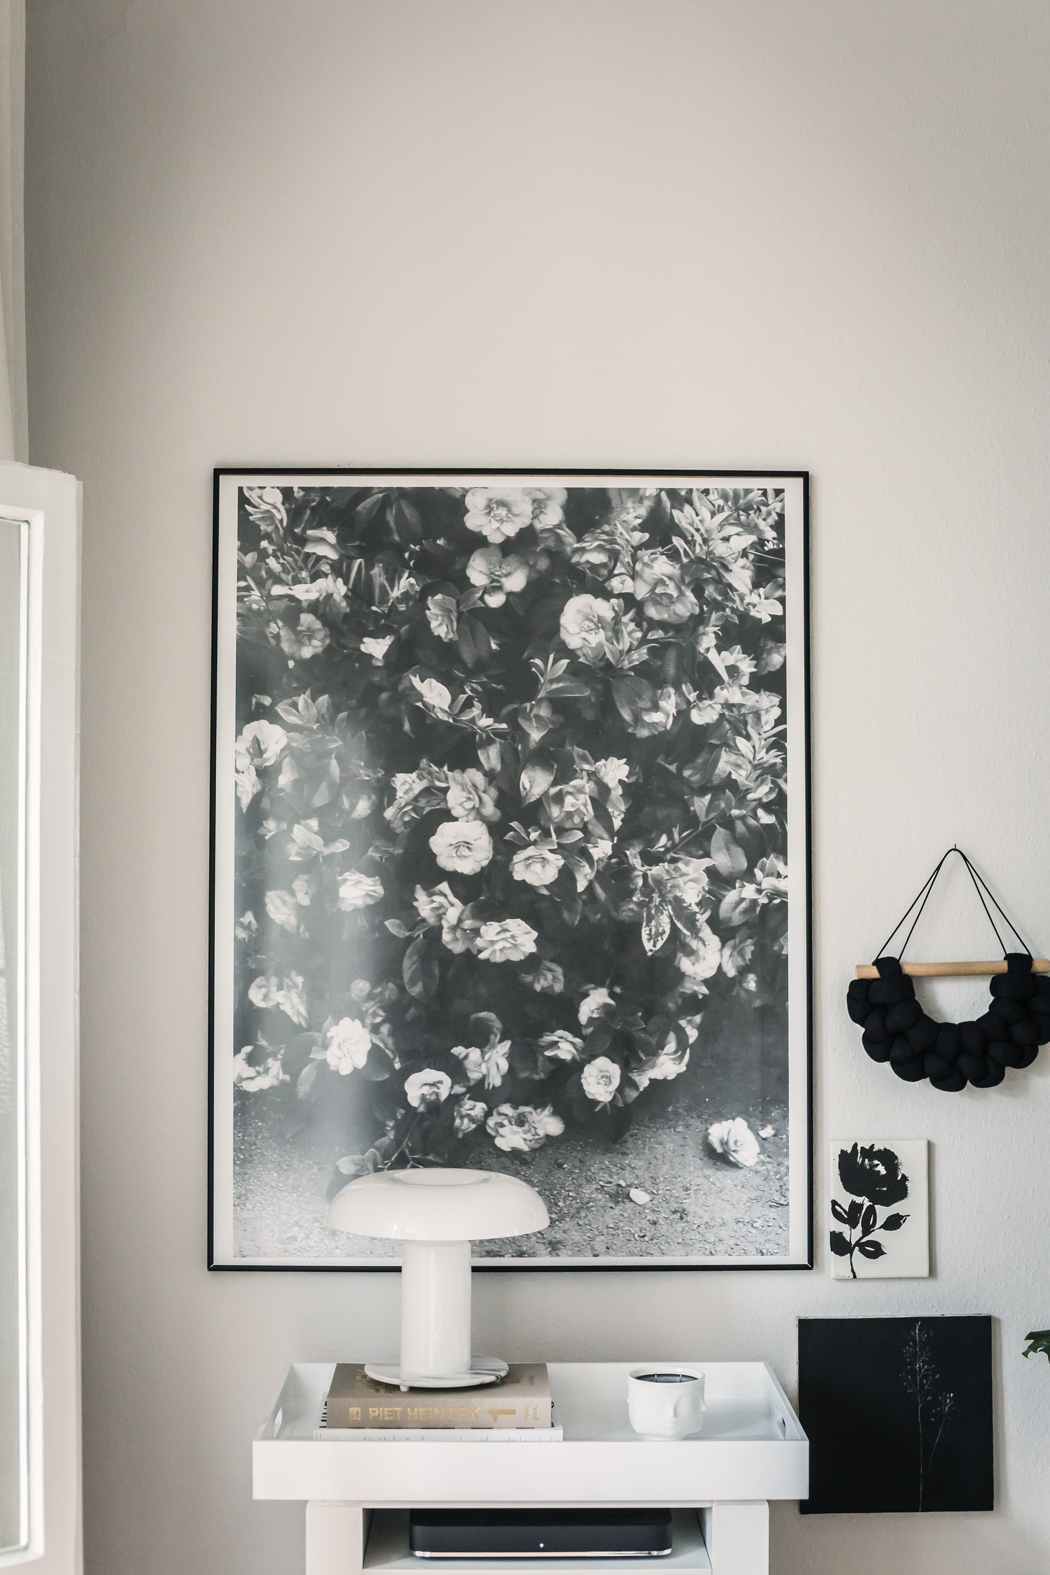 8 Ways To Decorate Around a Flat Screen TV